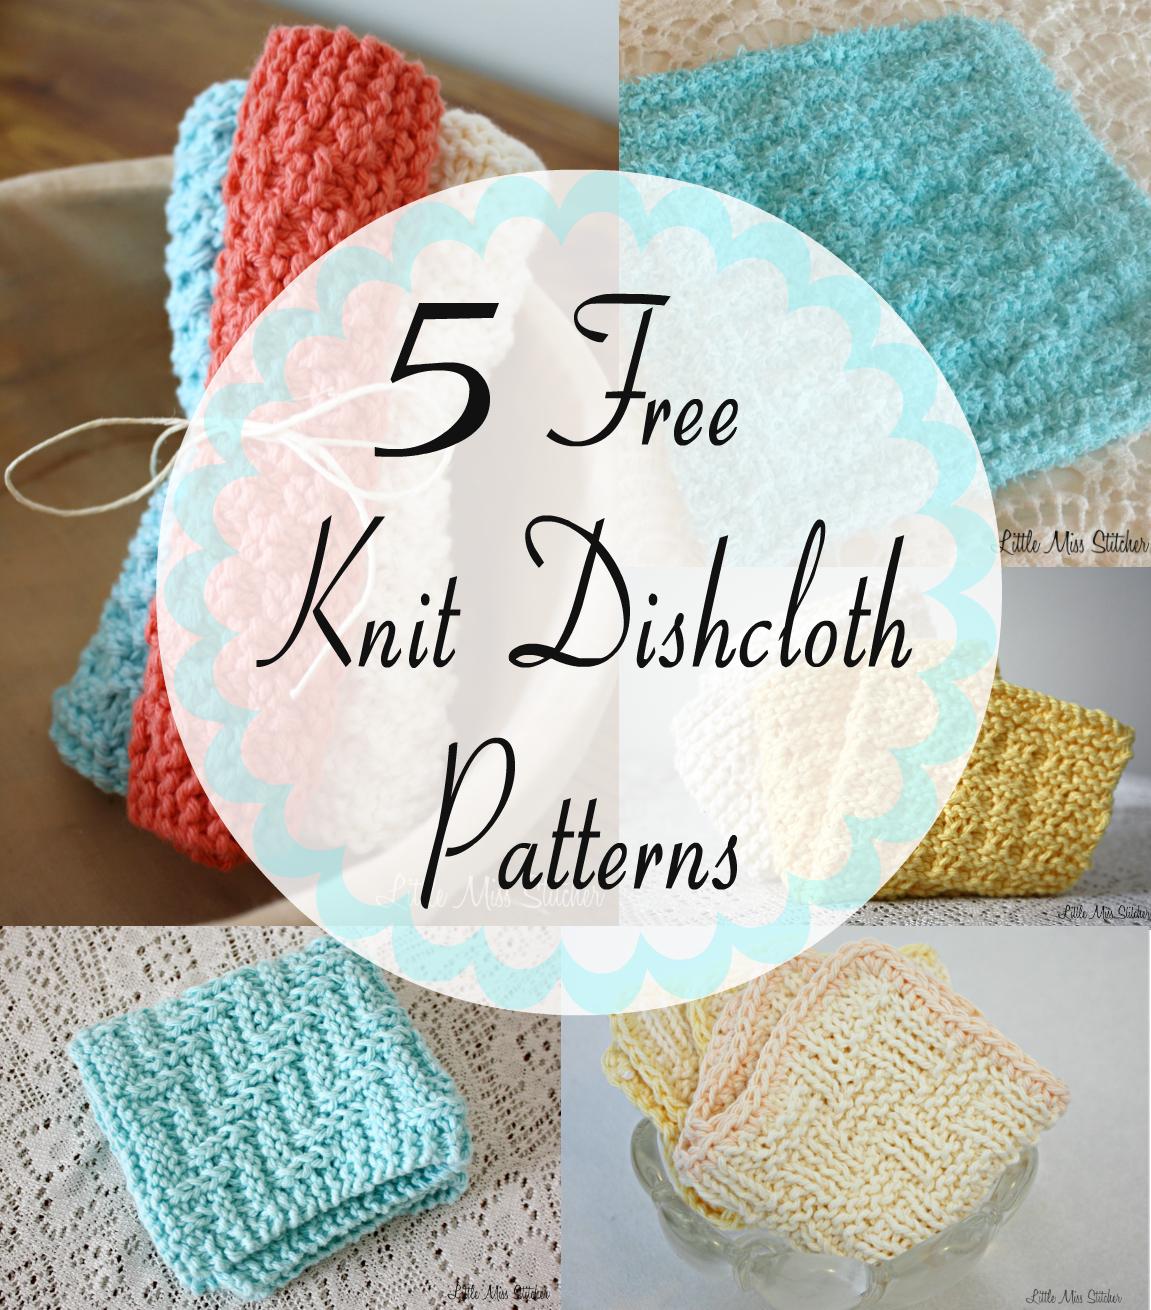 Knit Washcloth Patterns Little Miss Stitcher 5 Free Knit Dishcloth Patterns